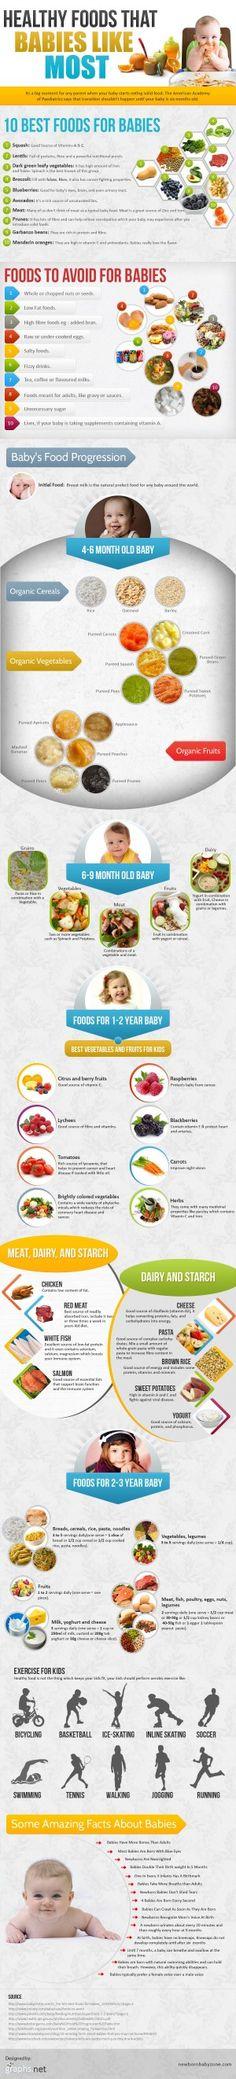 Great tips on feeding baby.